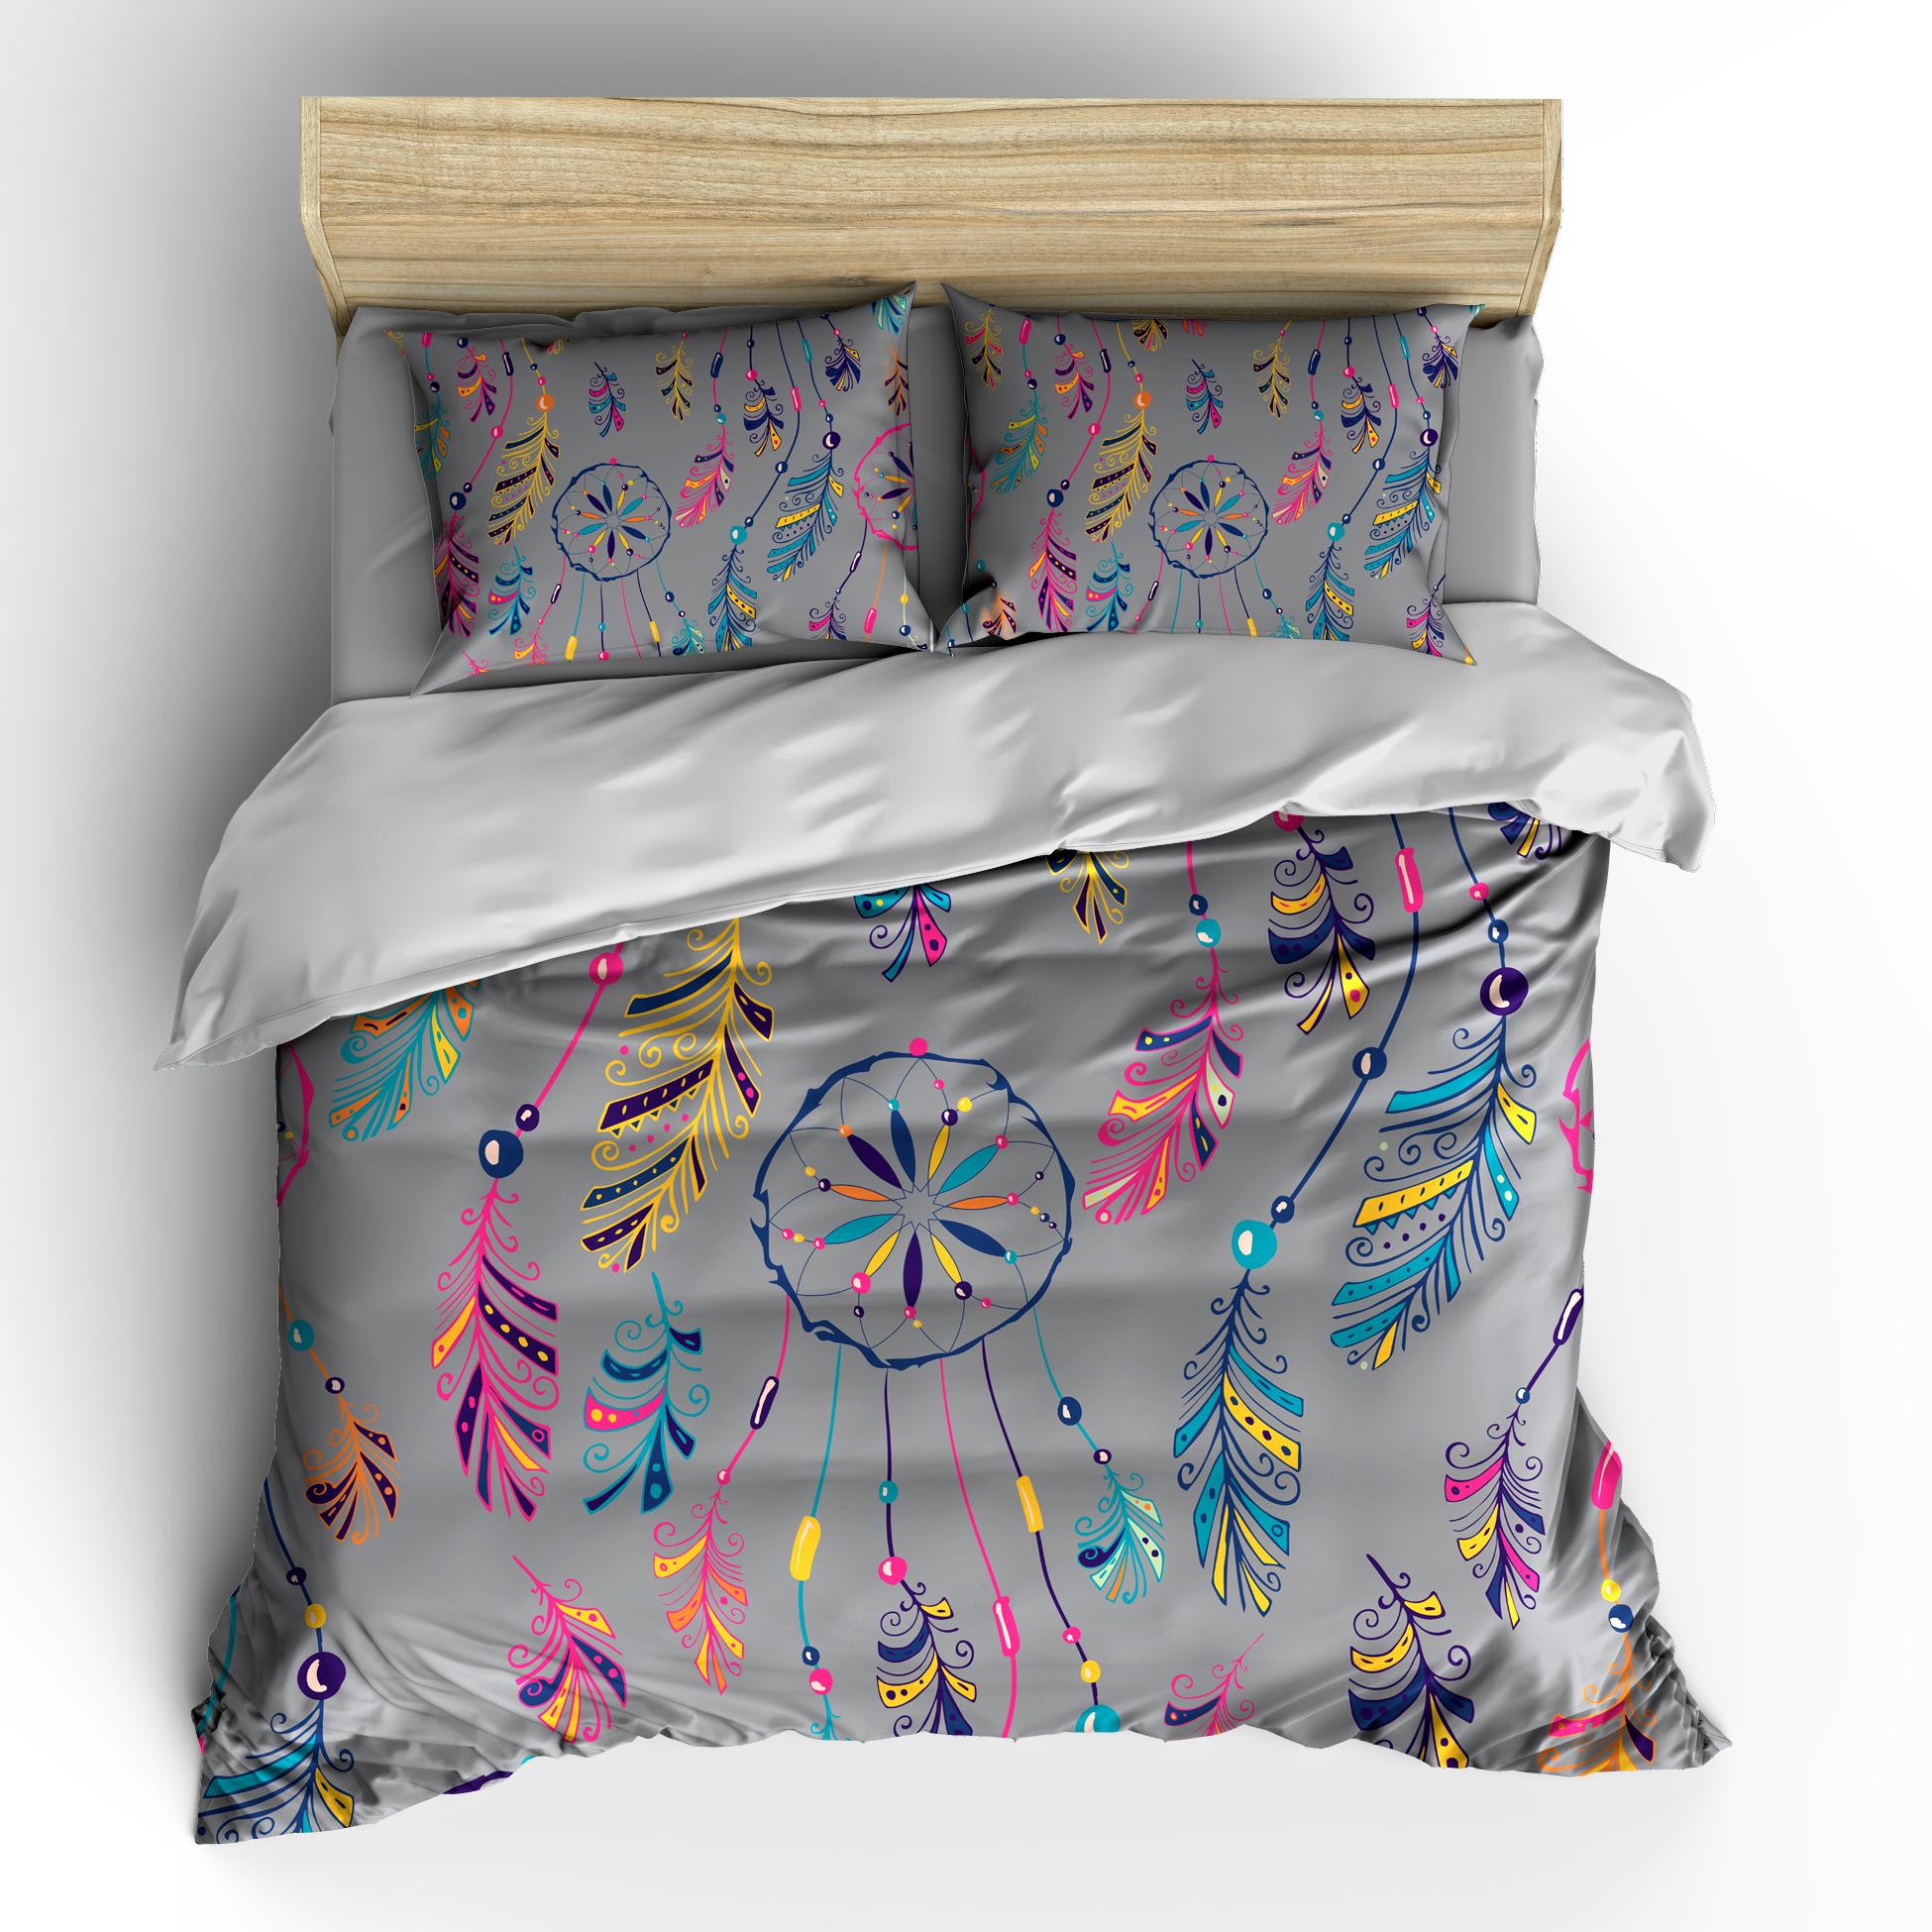 Dreams Catcher Cool Grey Bedding Set, Duvet or Comforter